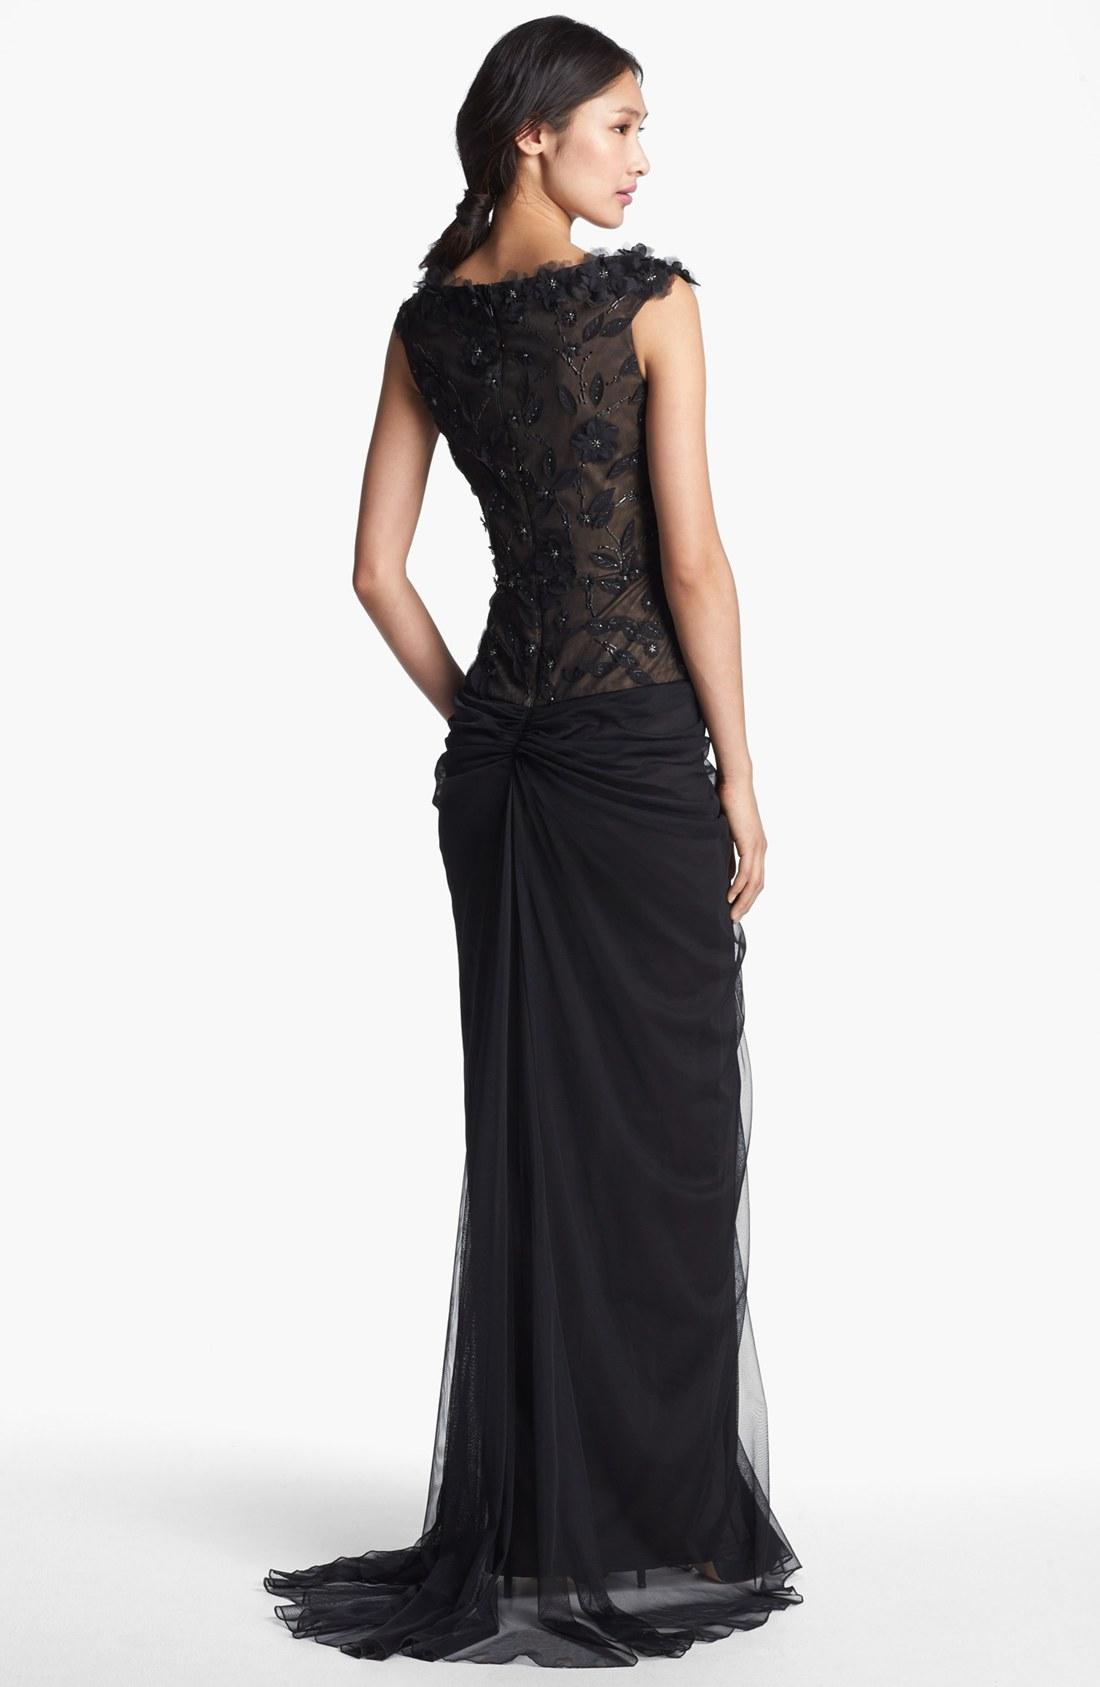 Tadashi Illusion Yoke Beaded Gown – fashion dresses